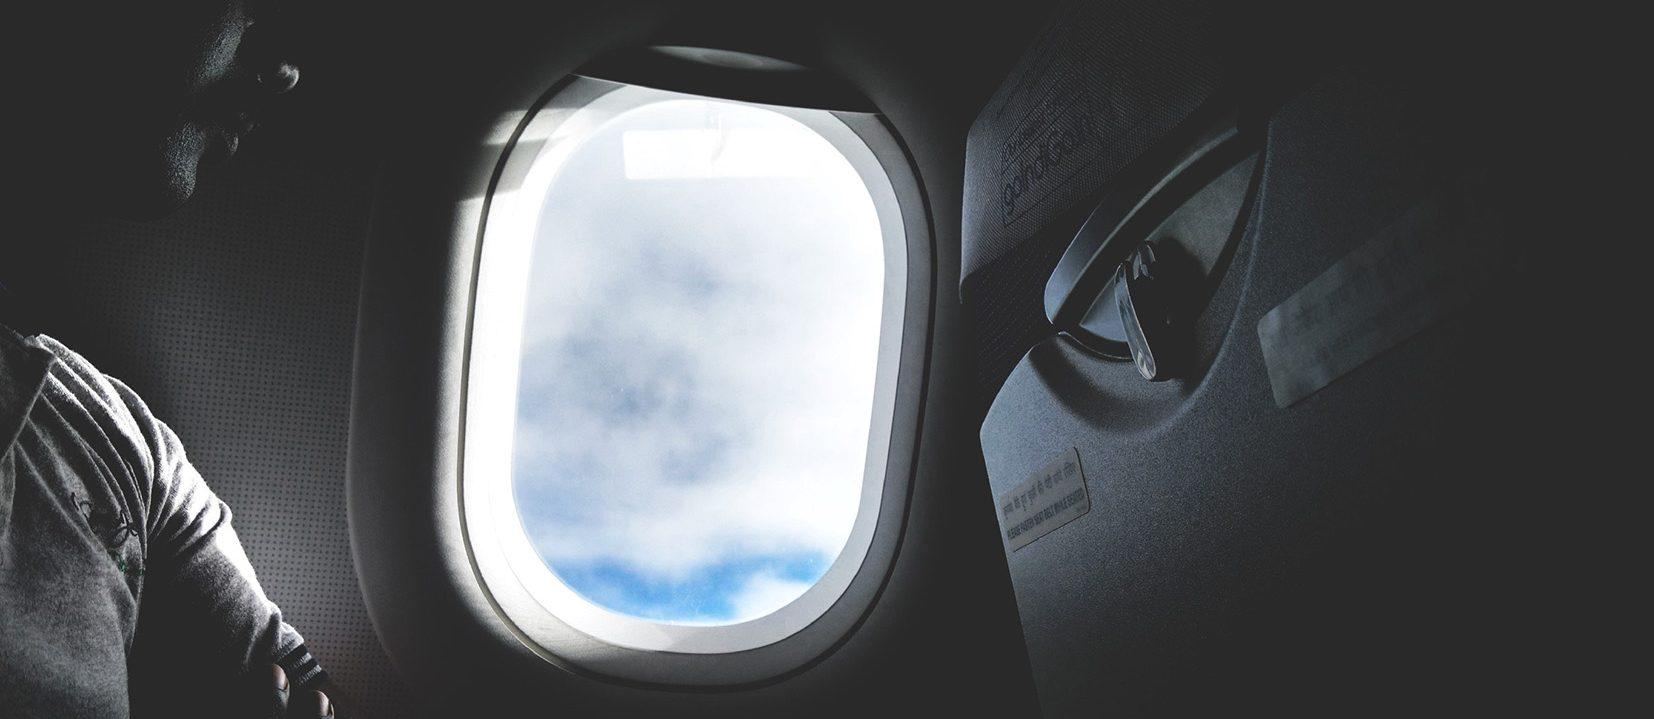 Airplane-window (Anugrah Lohiya)